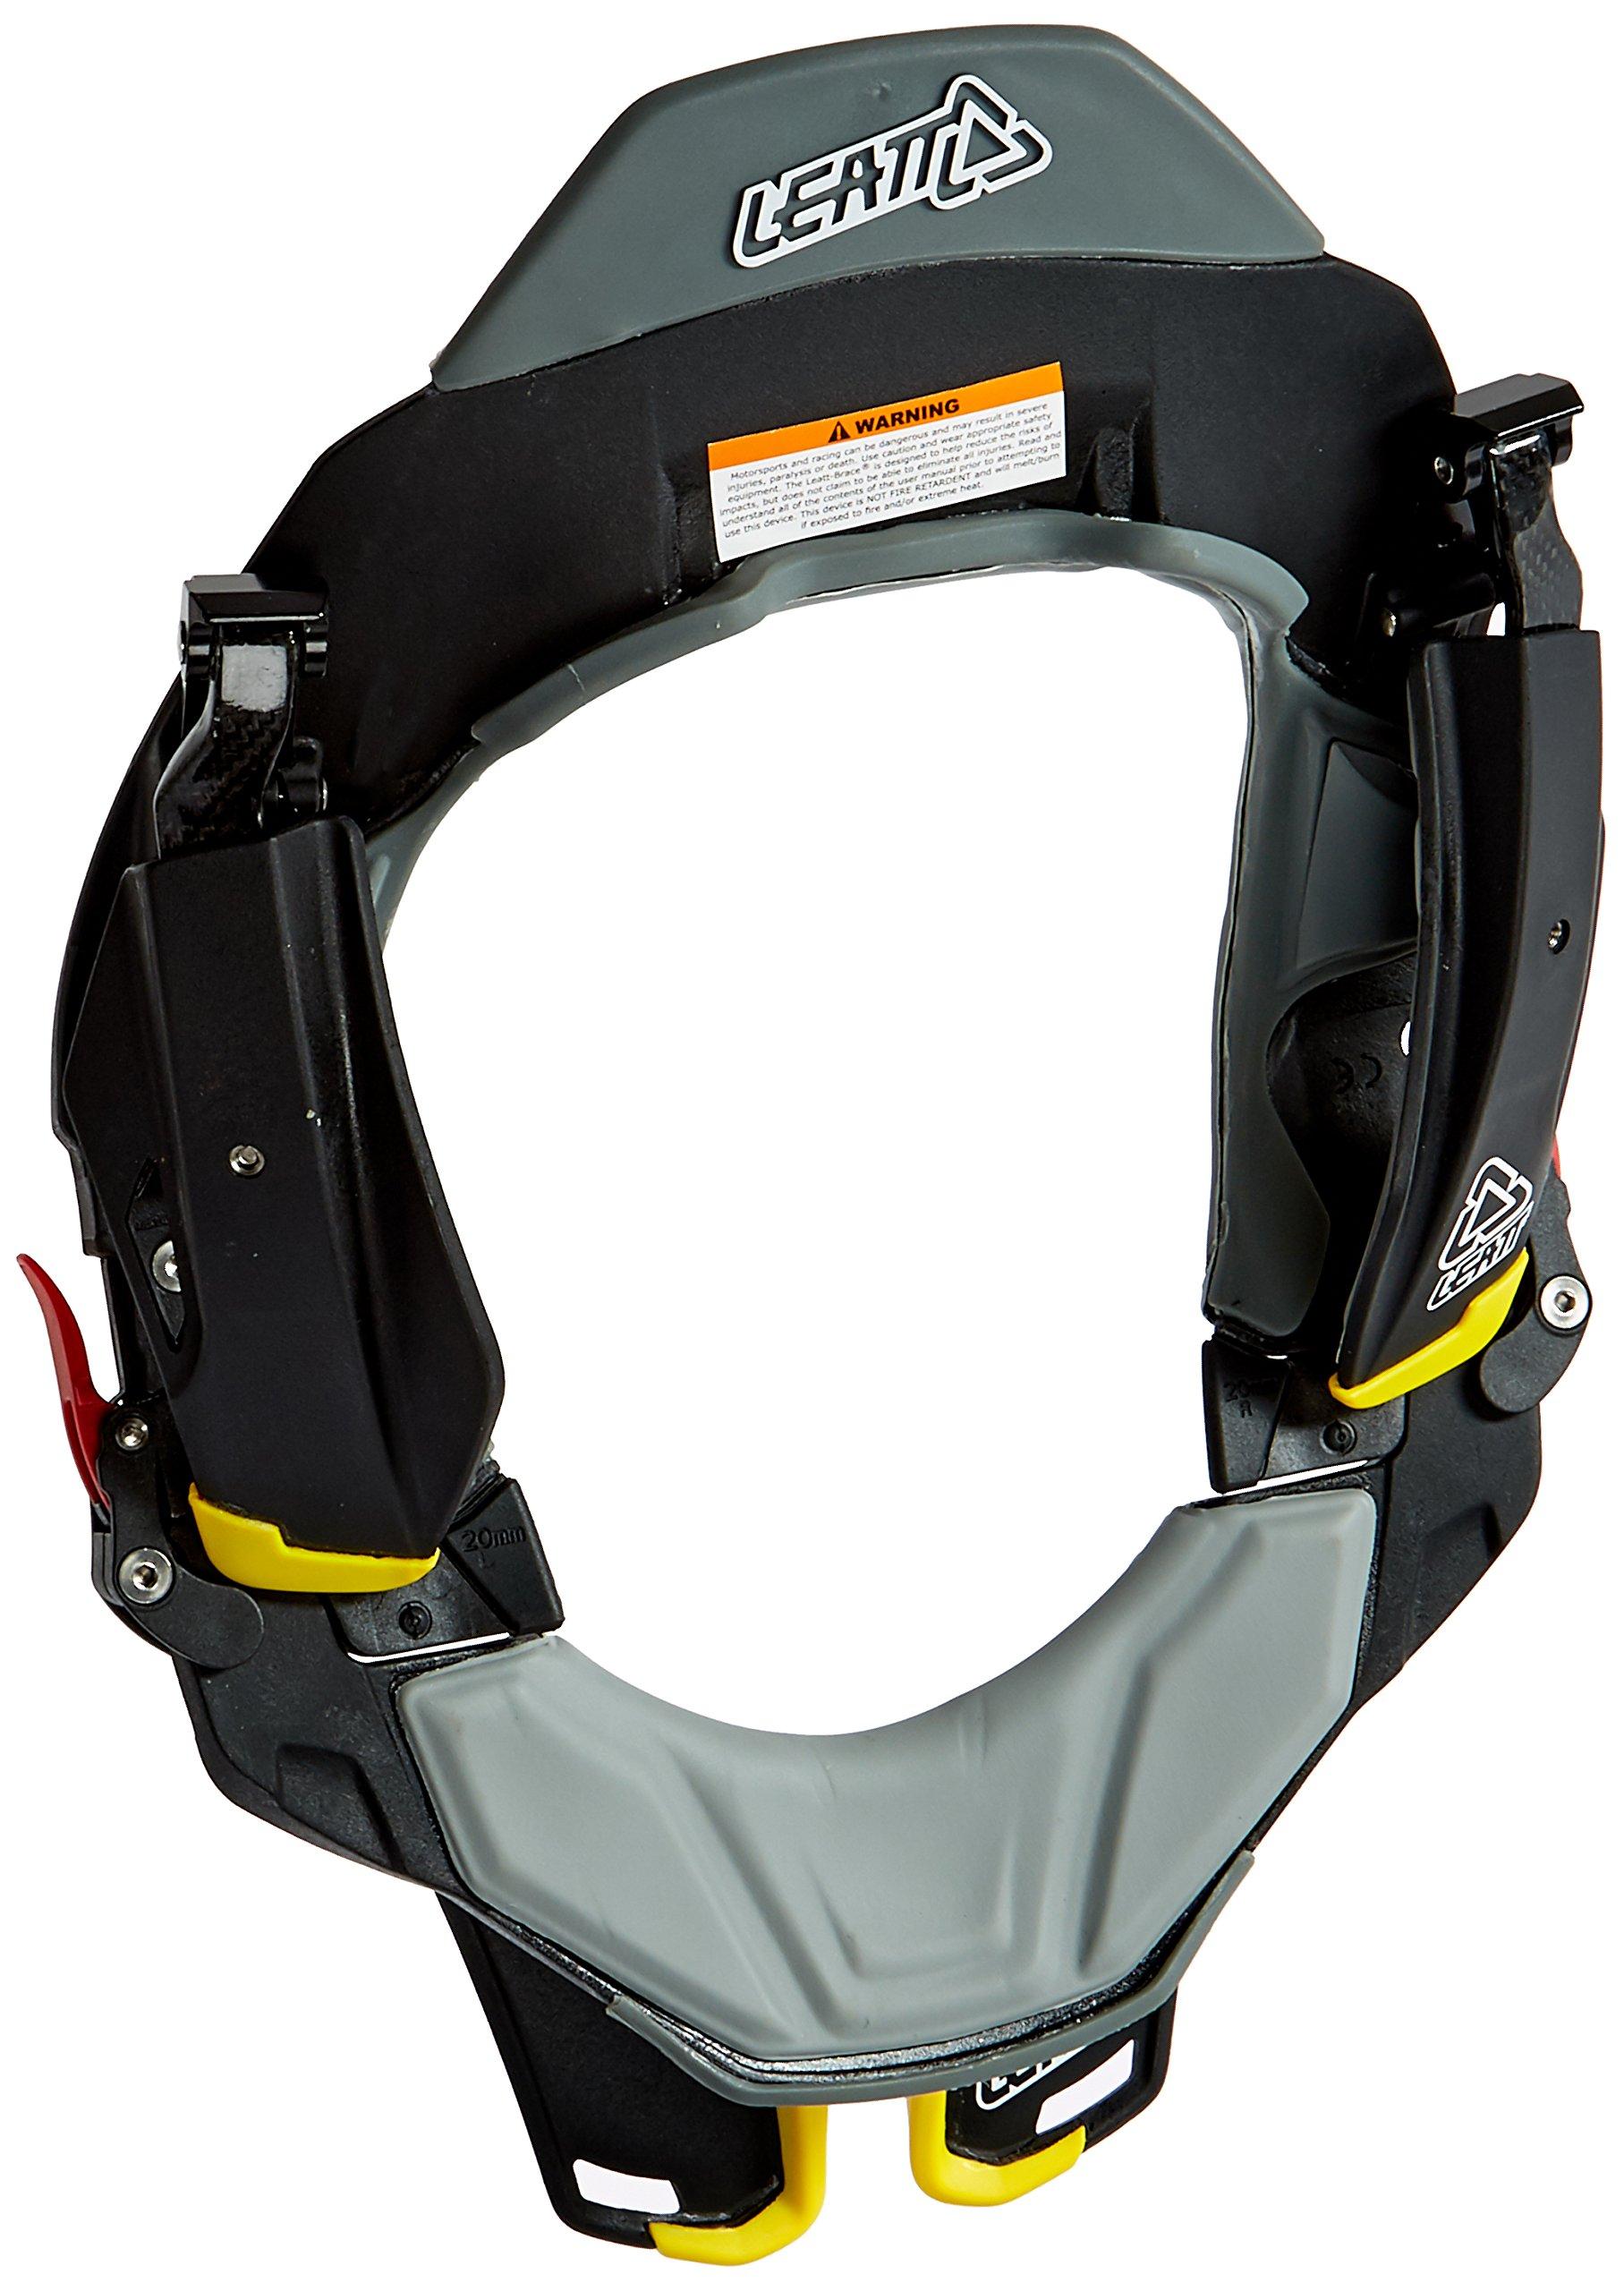 Leatt STX Road Neck Brace (Black/Grey/Yellow, Small/Medium)